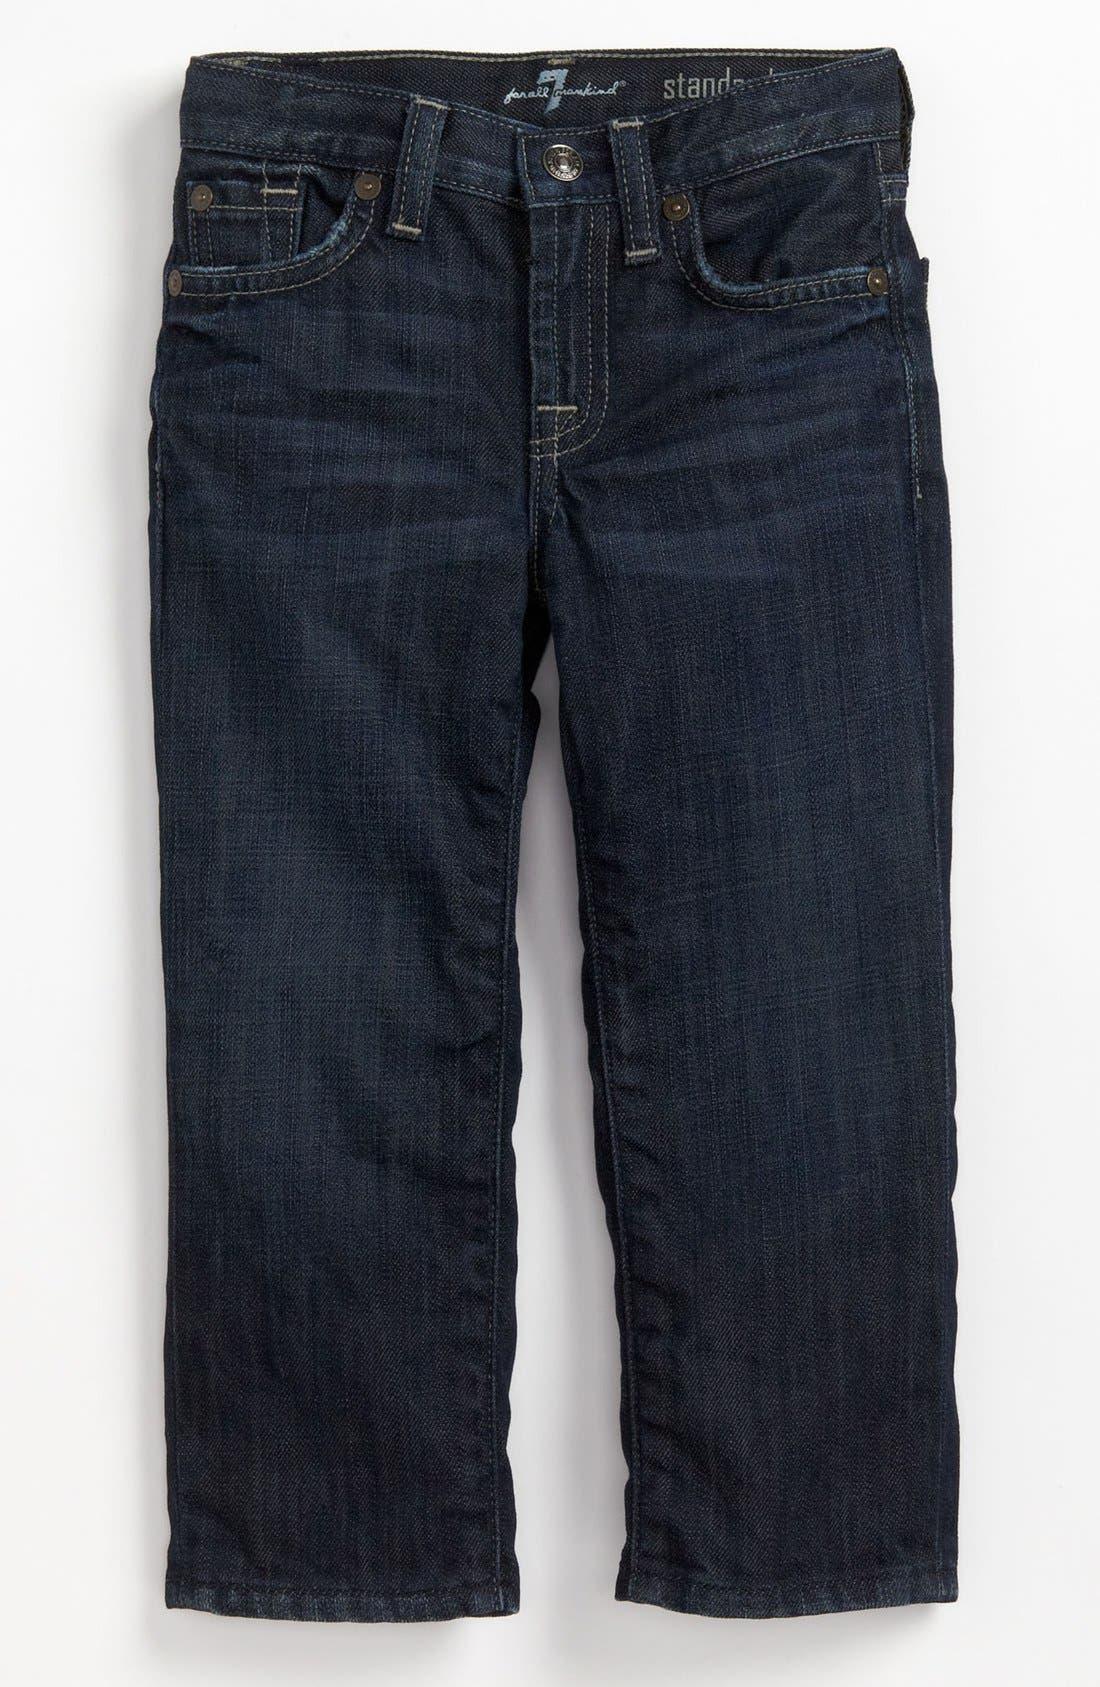 Alternate Image 2  - 7 For All Mankind® 'Standard' Straight Leg Jeans (Toddler Boys) (Online Only)